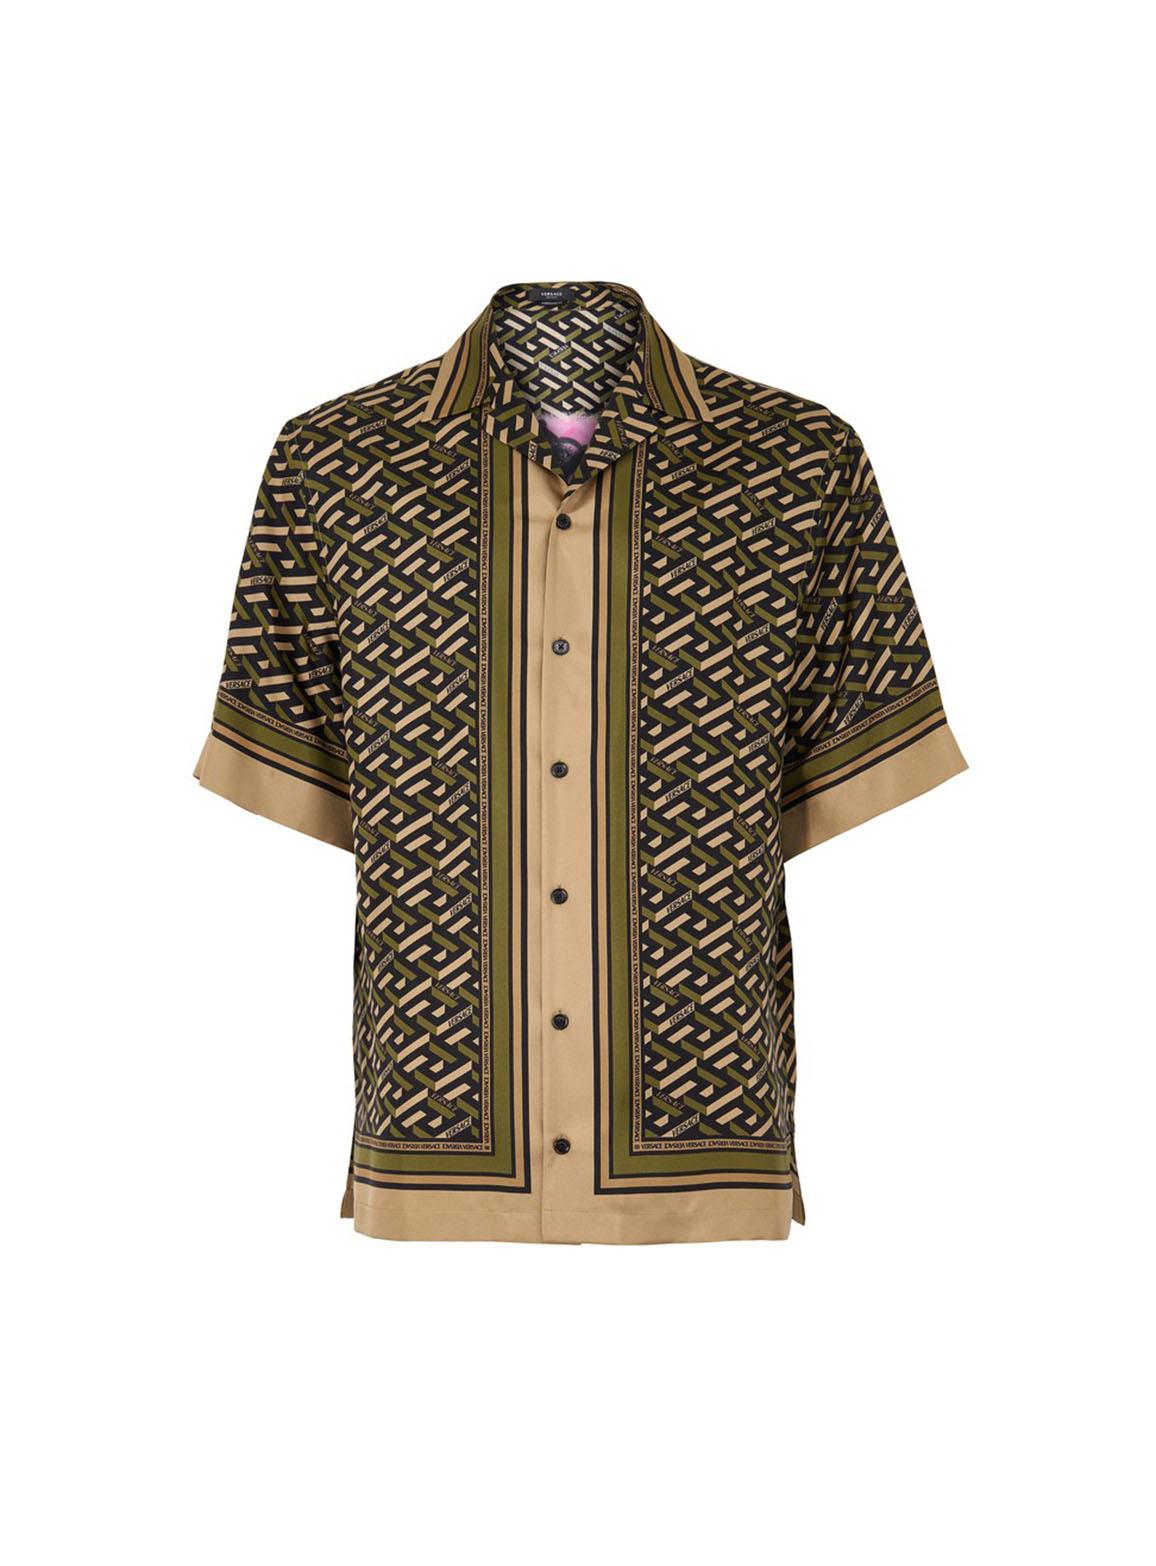 Monogram Foulard and Medusa Printed Shirt